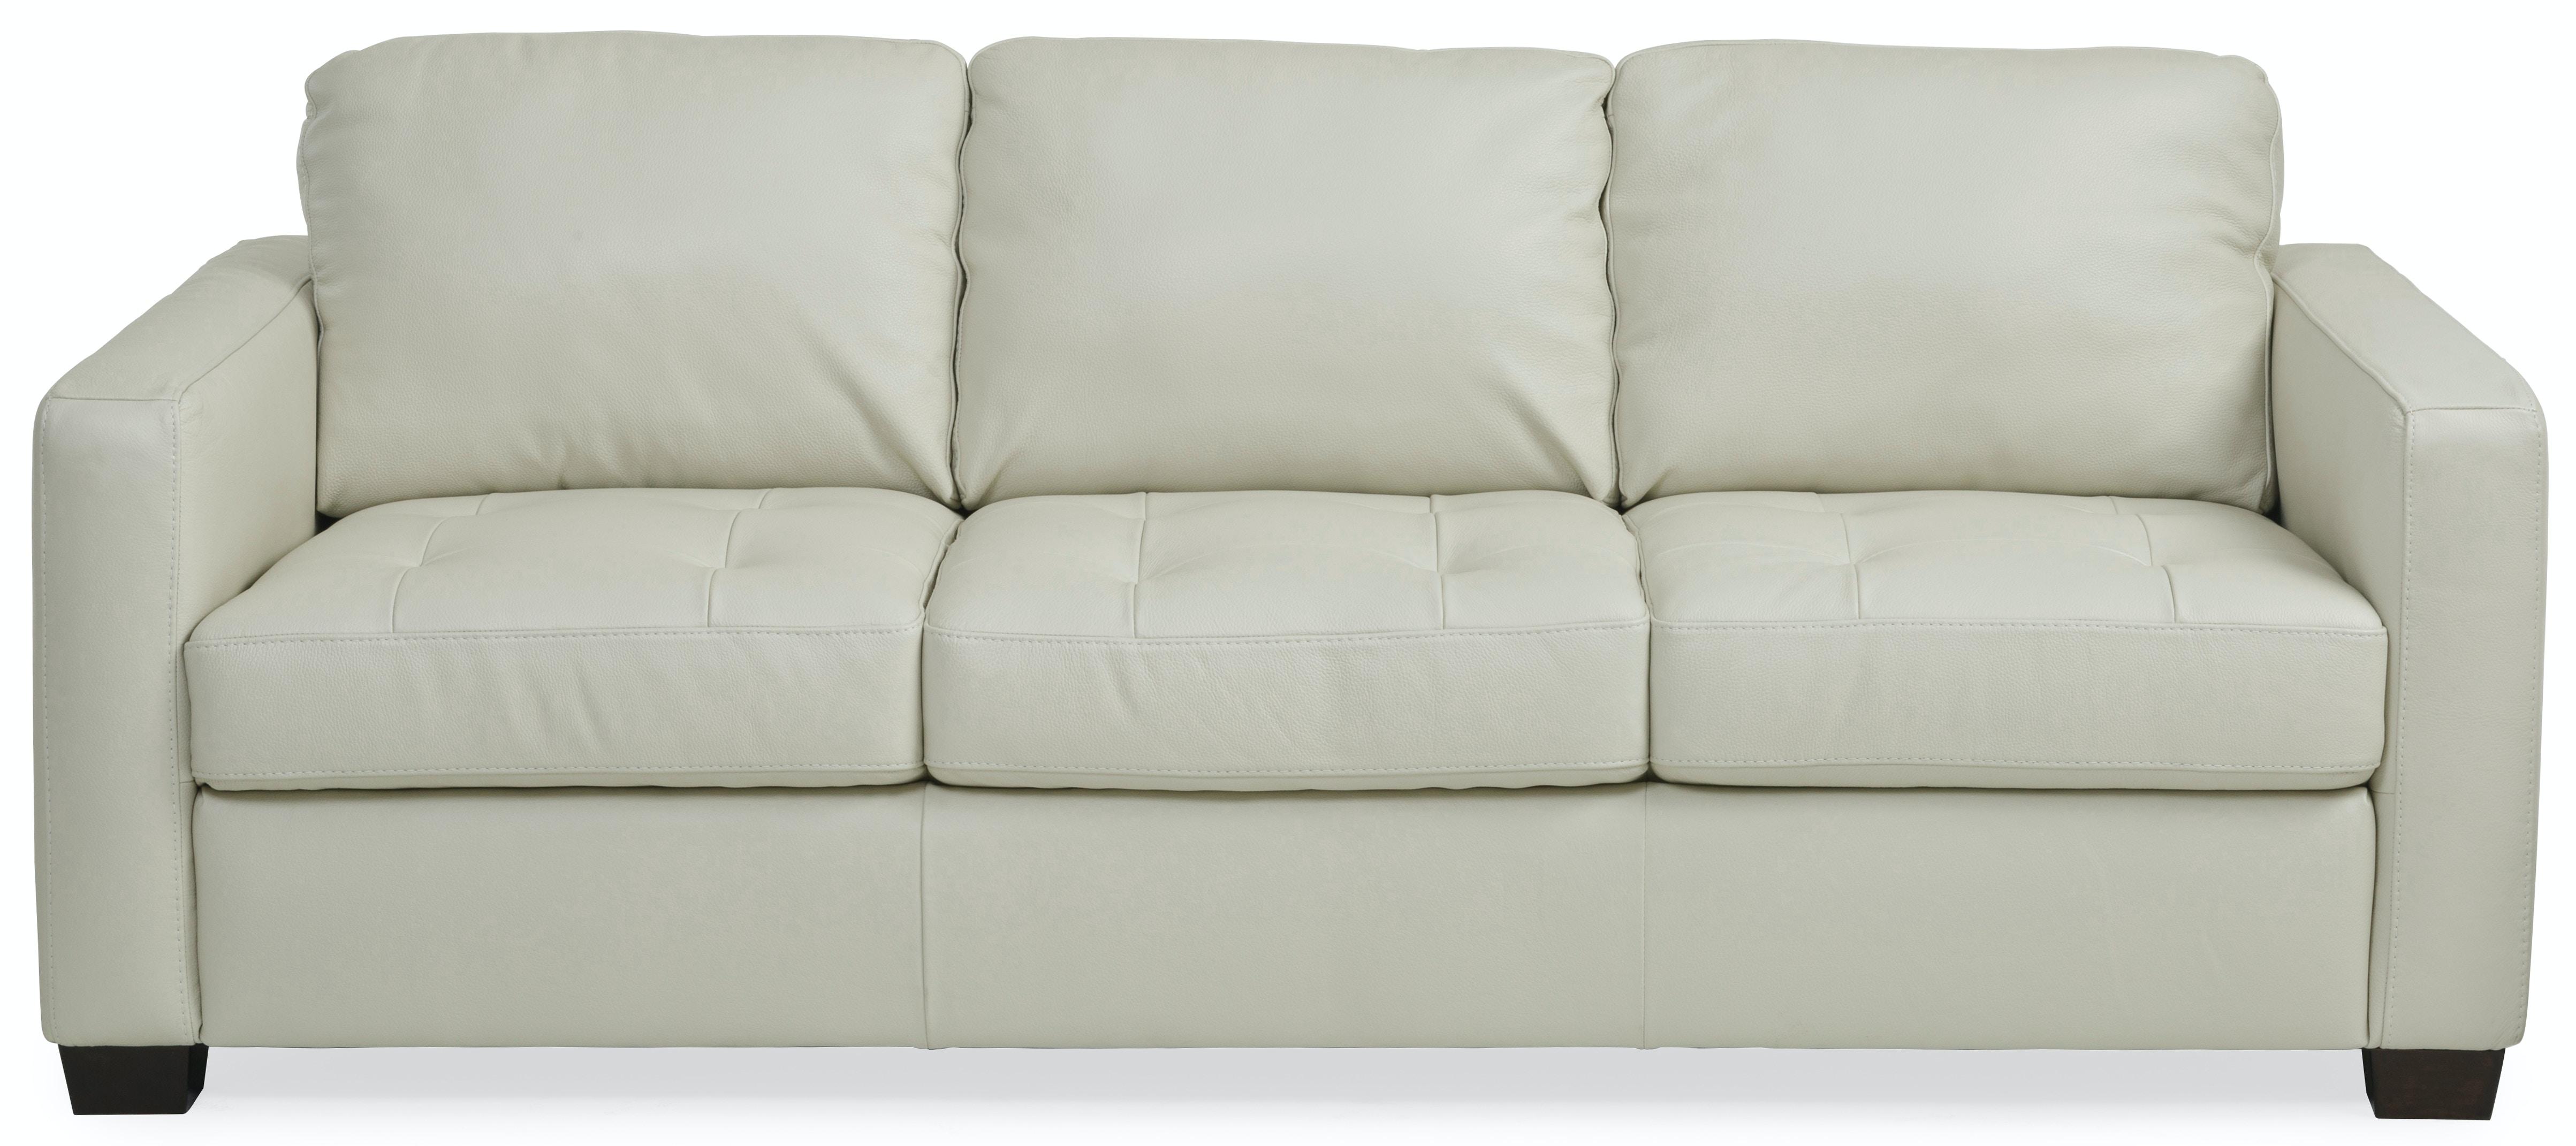 Denver Leather Sofa   IVORY ST:411896